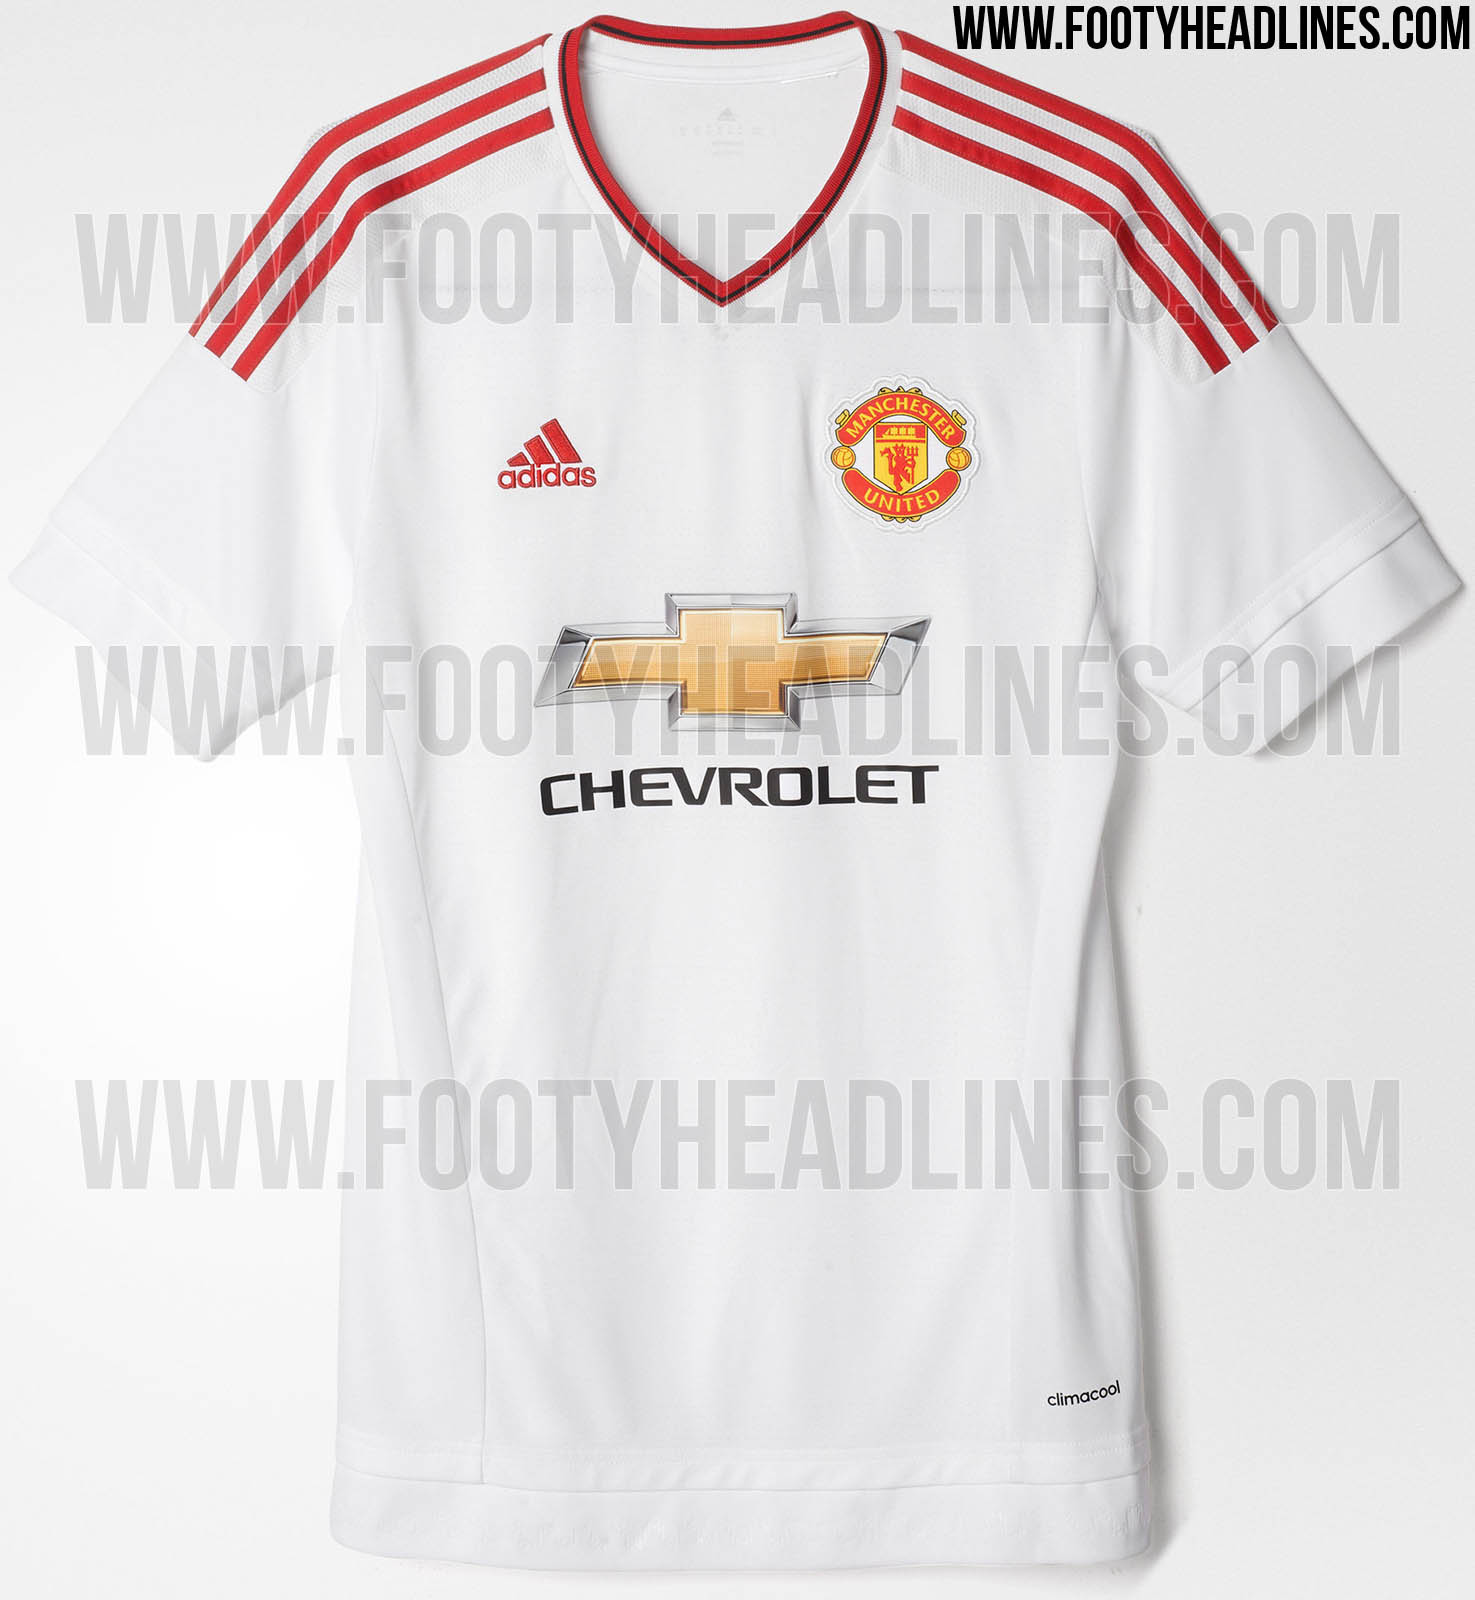 http://uupload.ir/files/7rwt_manchester-united-15-16-away-kit+_281_29.jpg